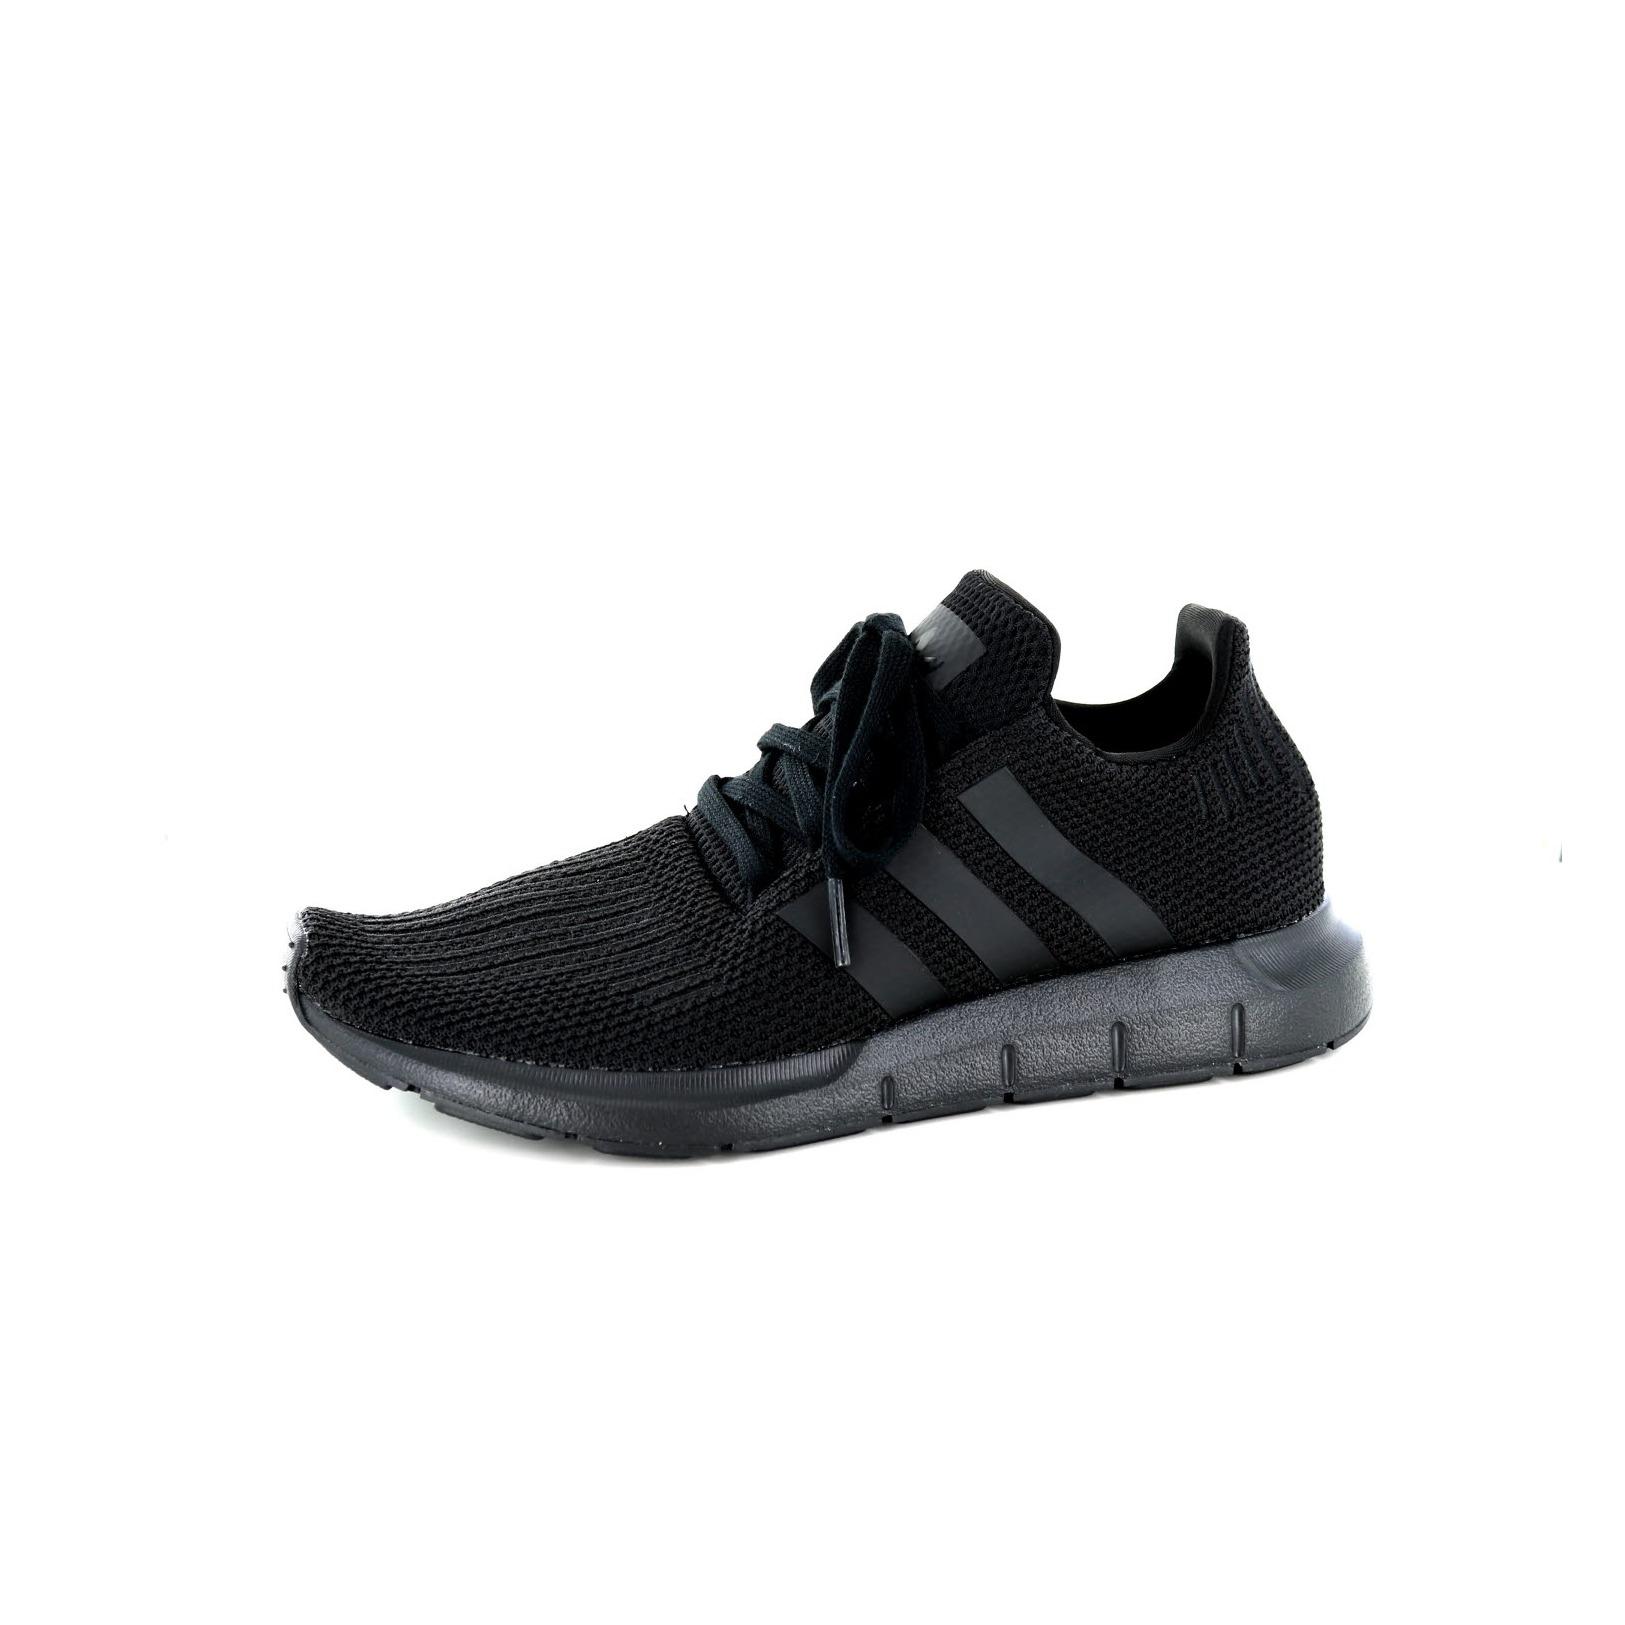 Adidas / Blonder Sko - Joggesko, Svart